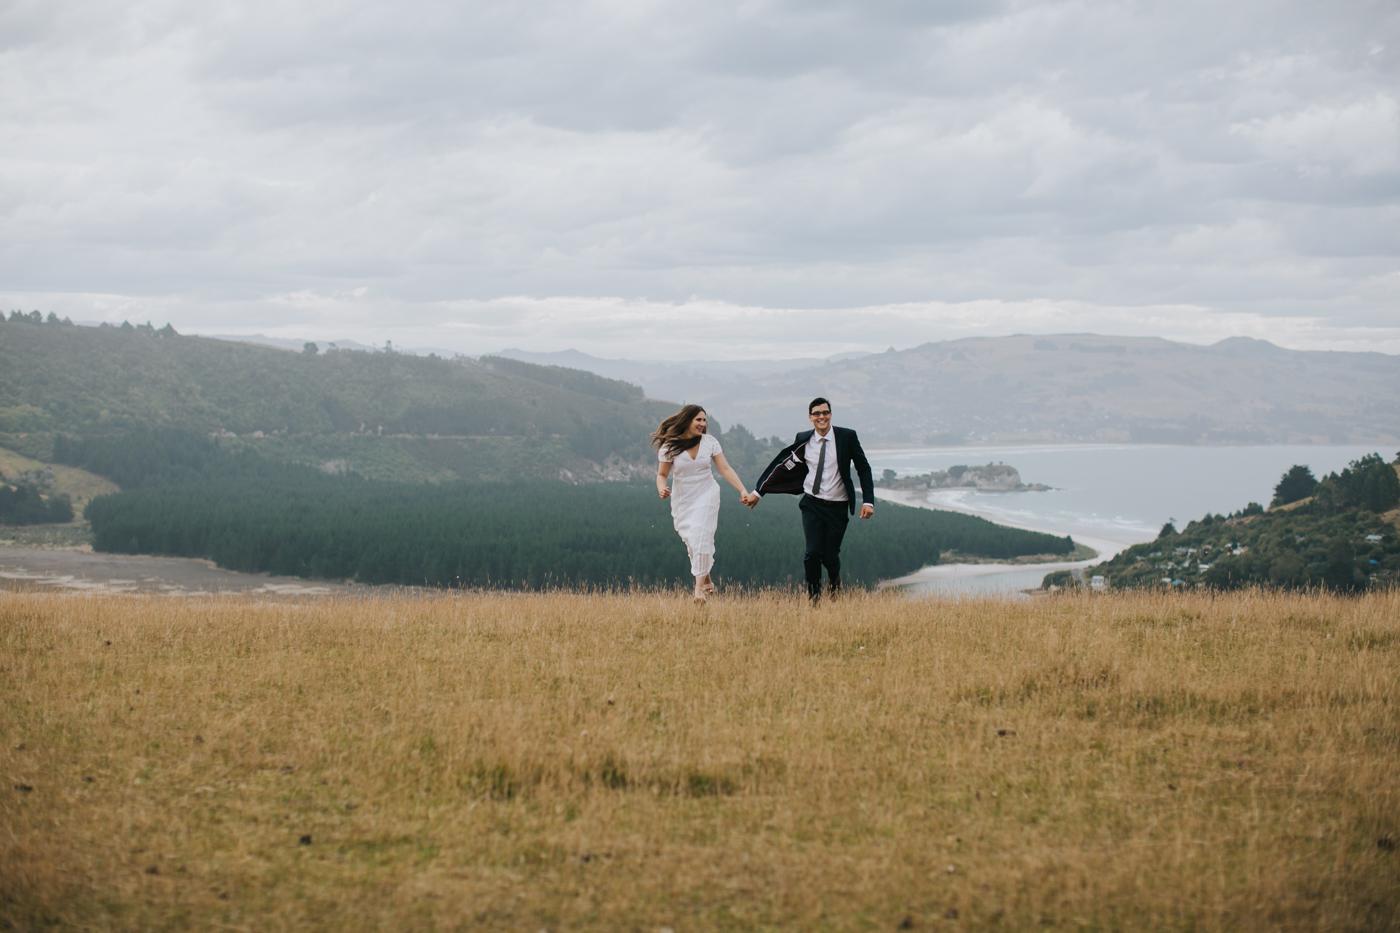 Ariana & Tim - Dunedin, New Zealand Wedding - Destination Wedding - Samantha Heather Photography-203.jpg